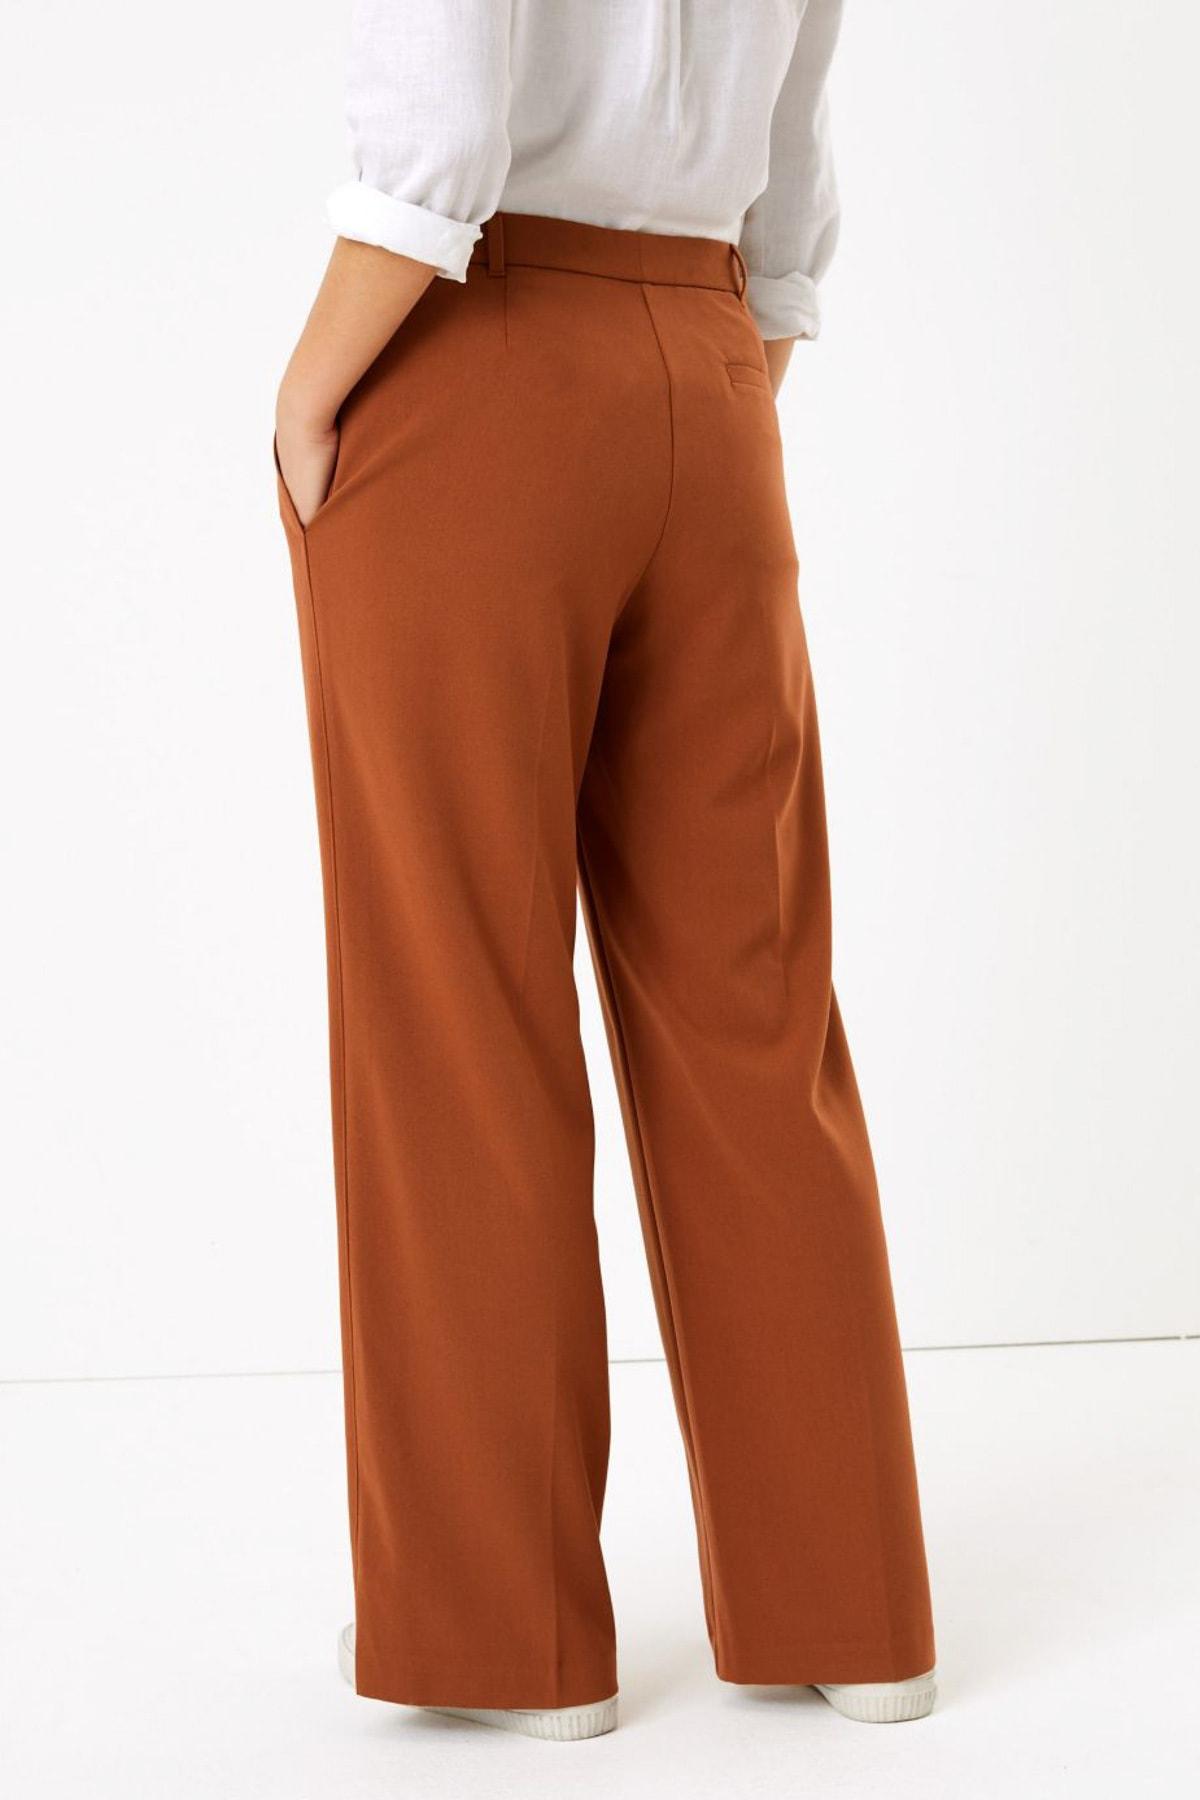 Marks & Spencer Kadın Kahverengi Wide Leg Pantolon T59006637 2